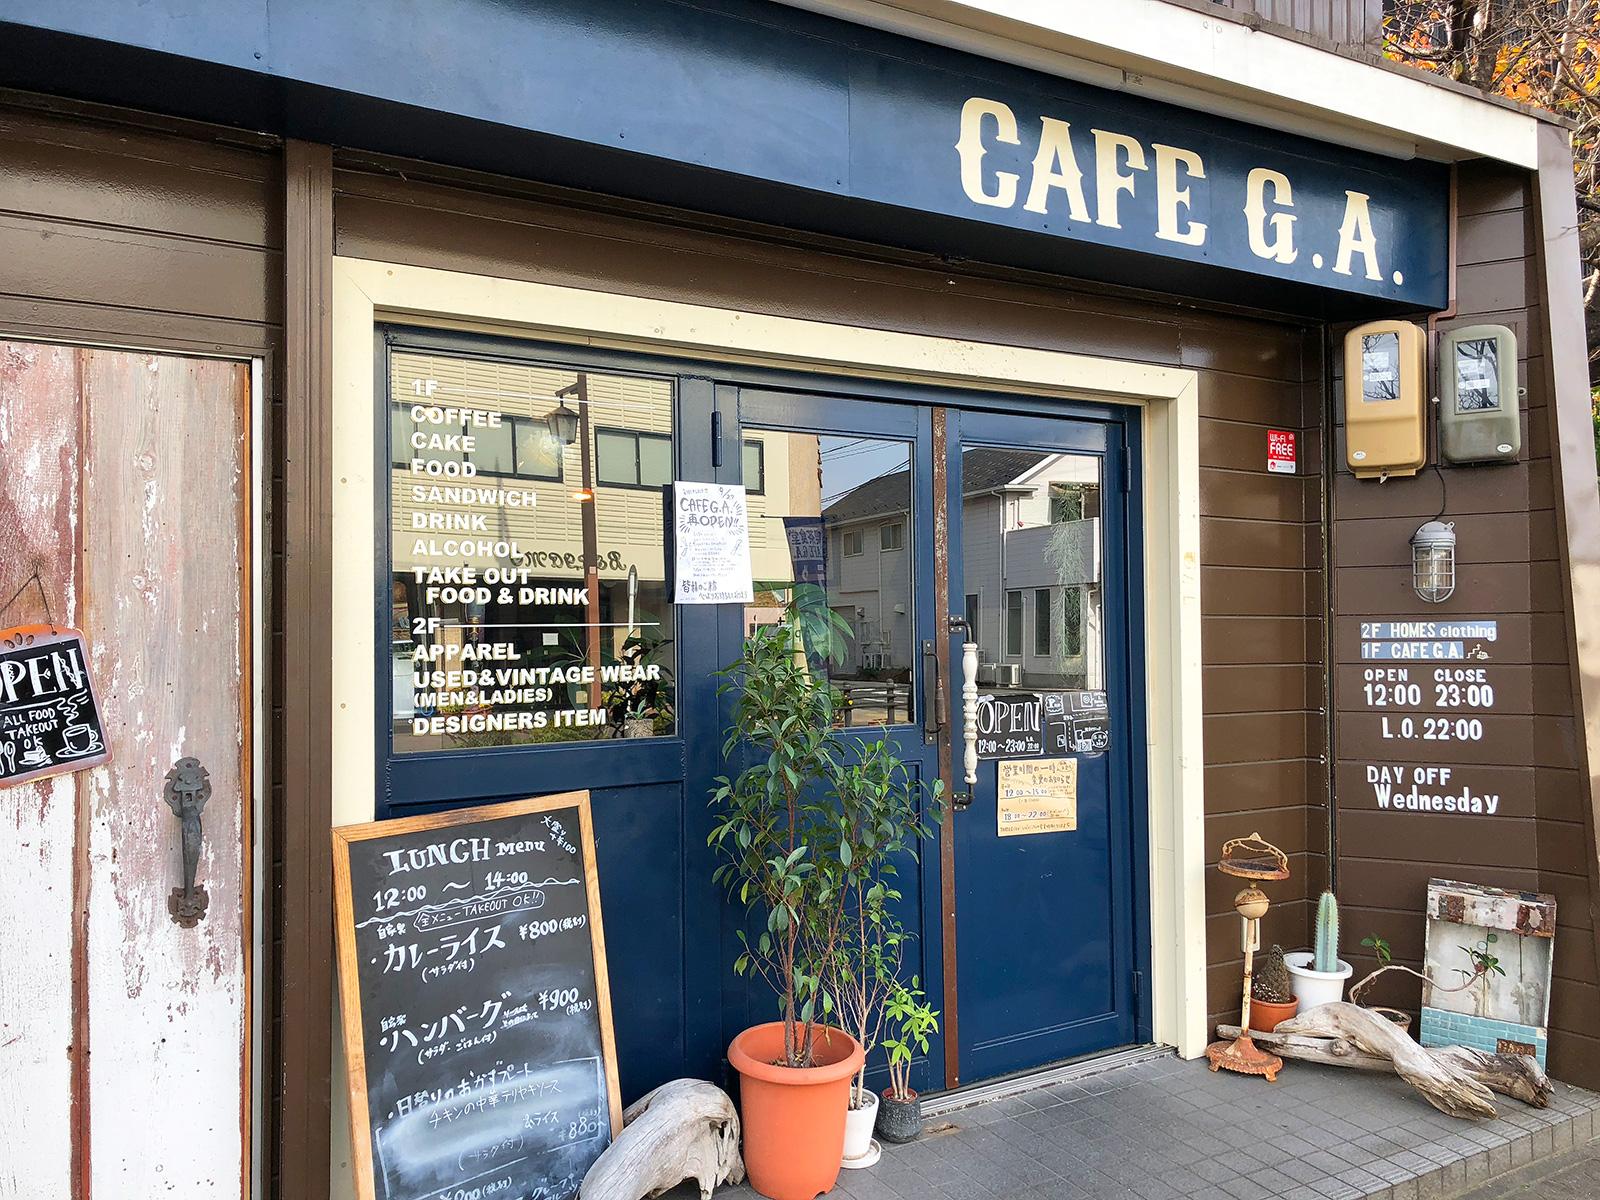 「CAFE G.A.」のチキンの中華テリヤキソースランチ @中川区五女子